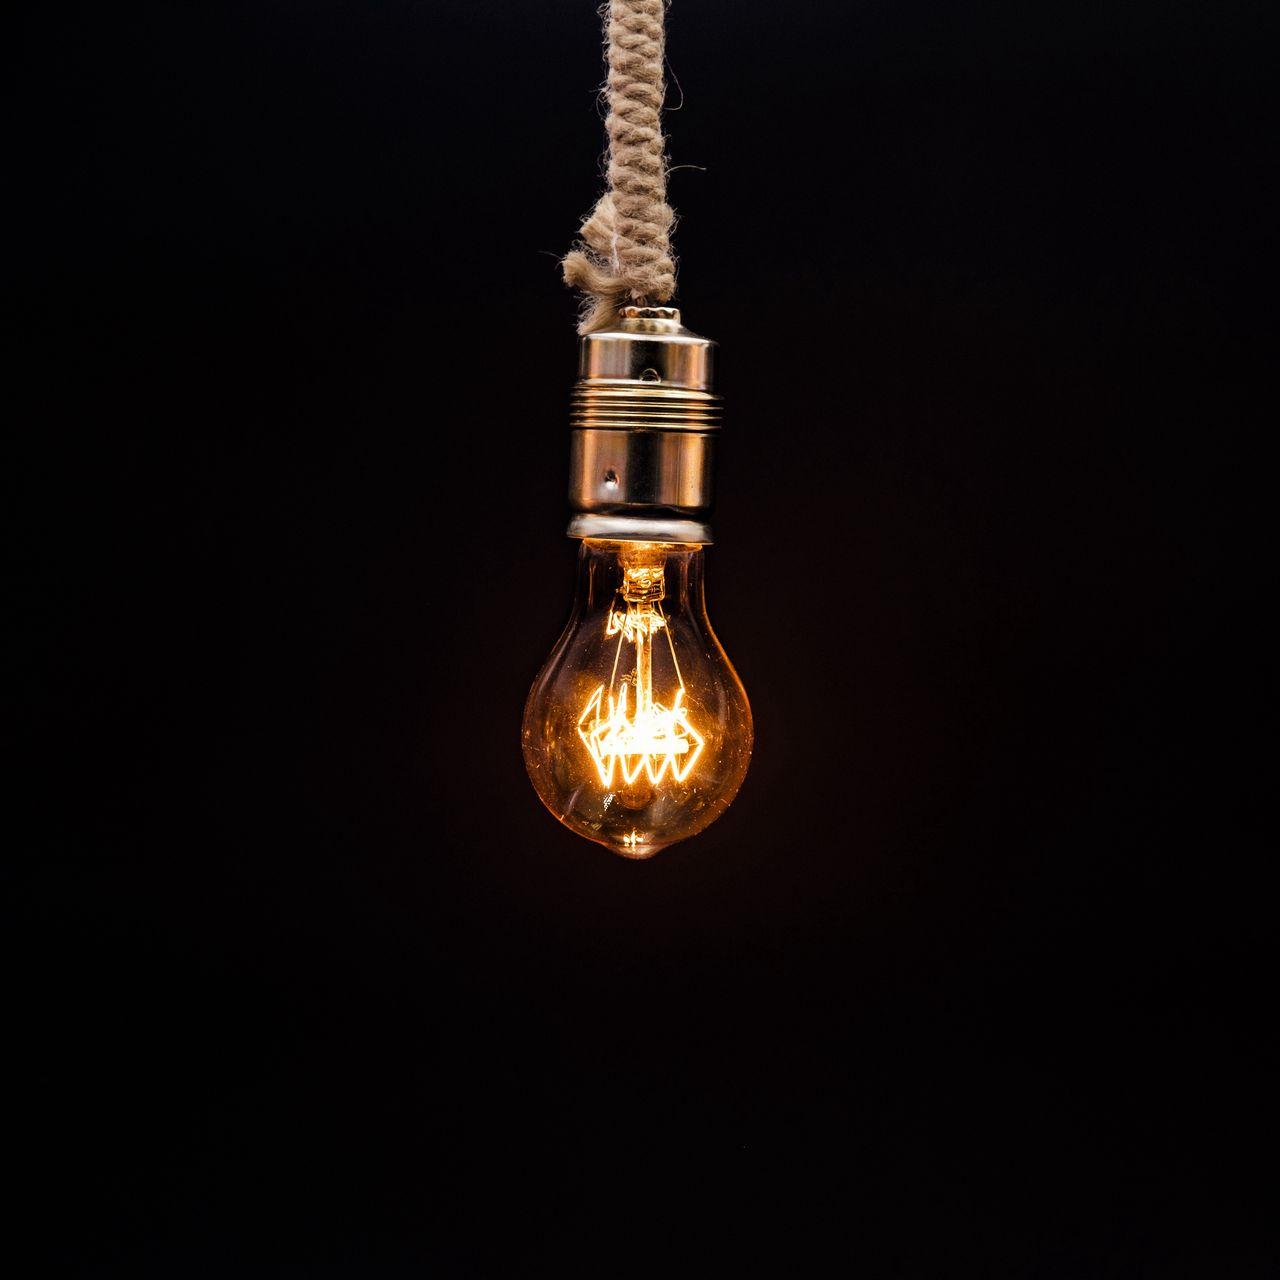 1280x1280 Wallpaper bulb, lighting, rope, electricity, edisons lamp